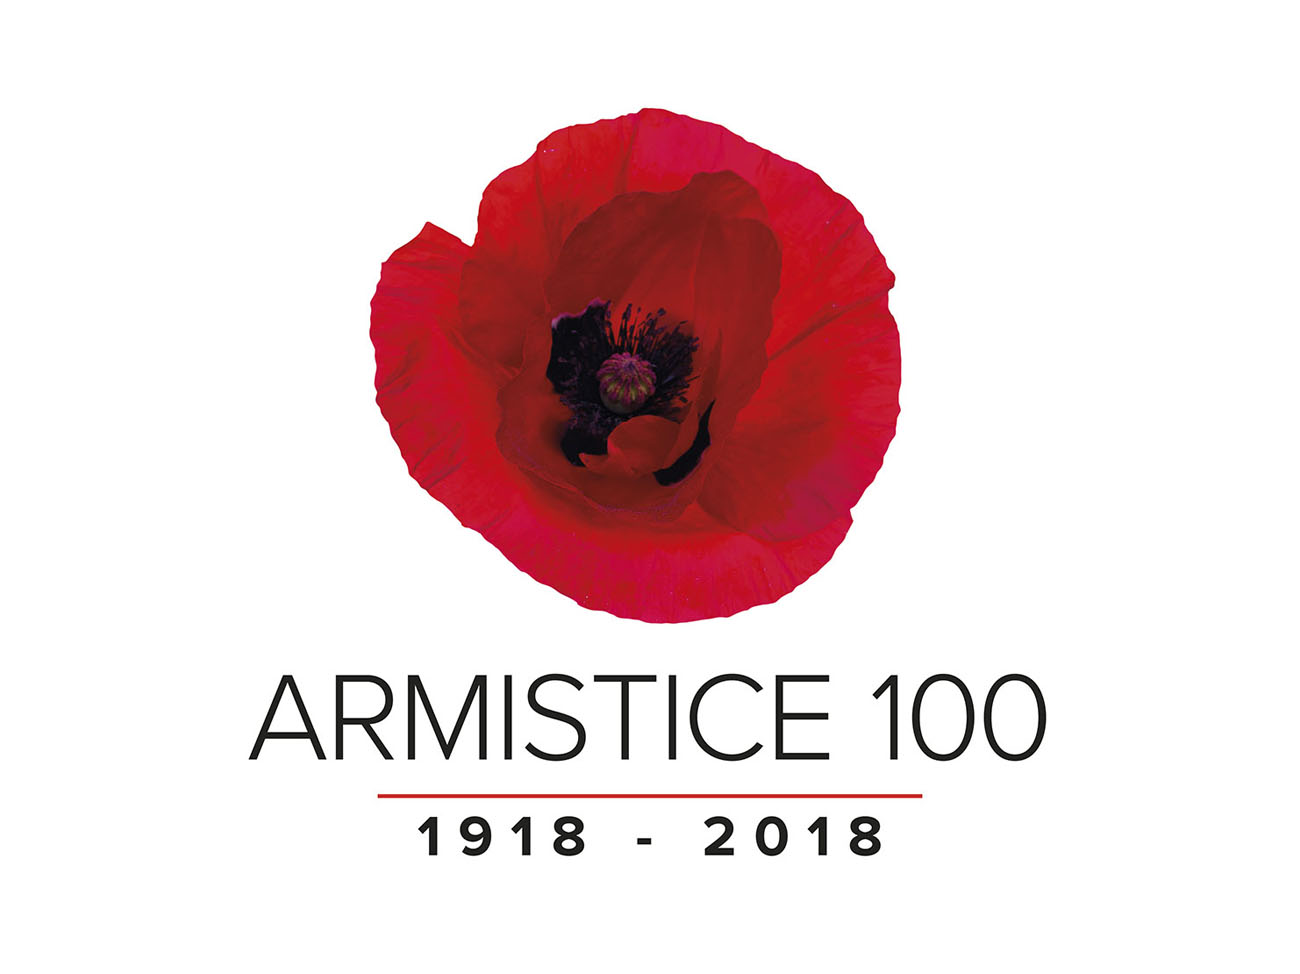 Armistice 100 Logo Designed by Brand Jam for the Armistice 100 Commemorations at the National Memorial Arboretum.